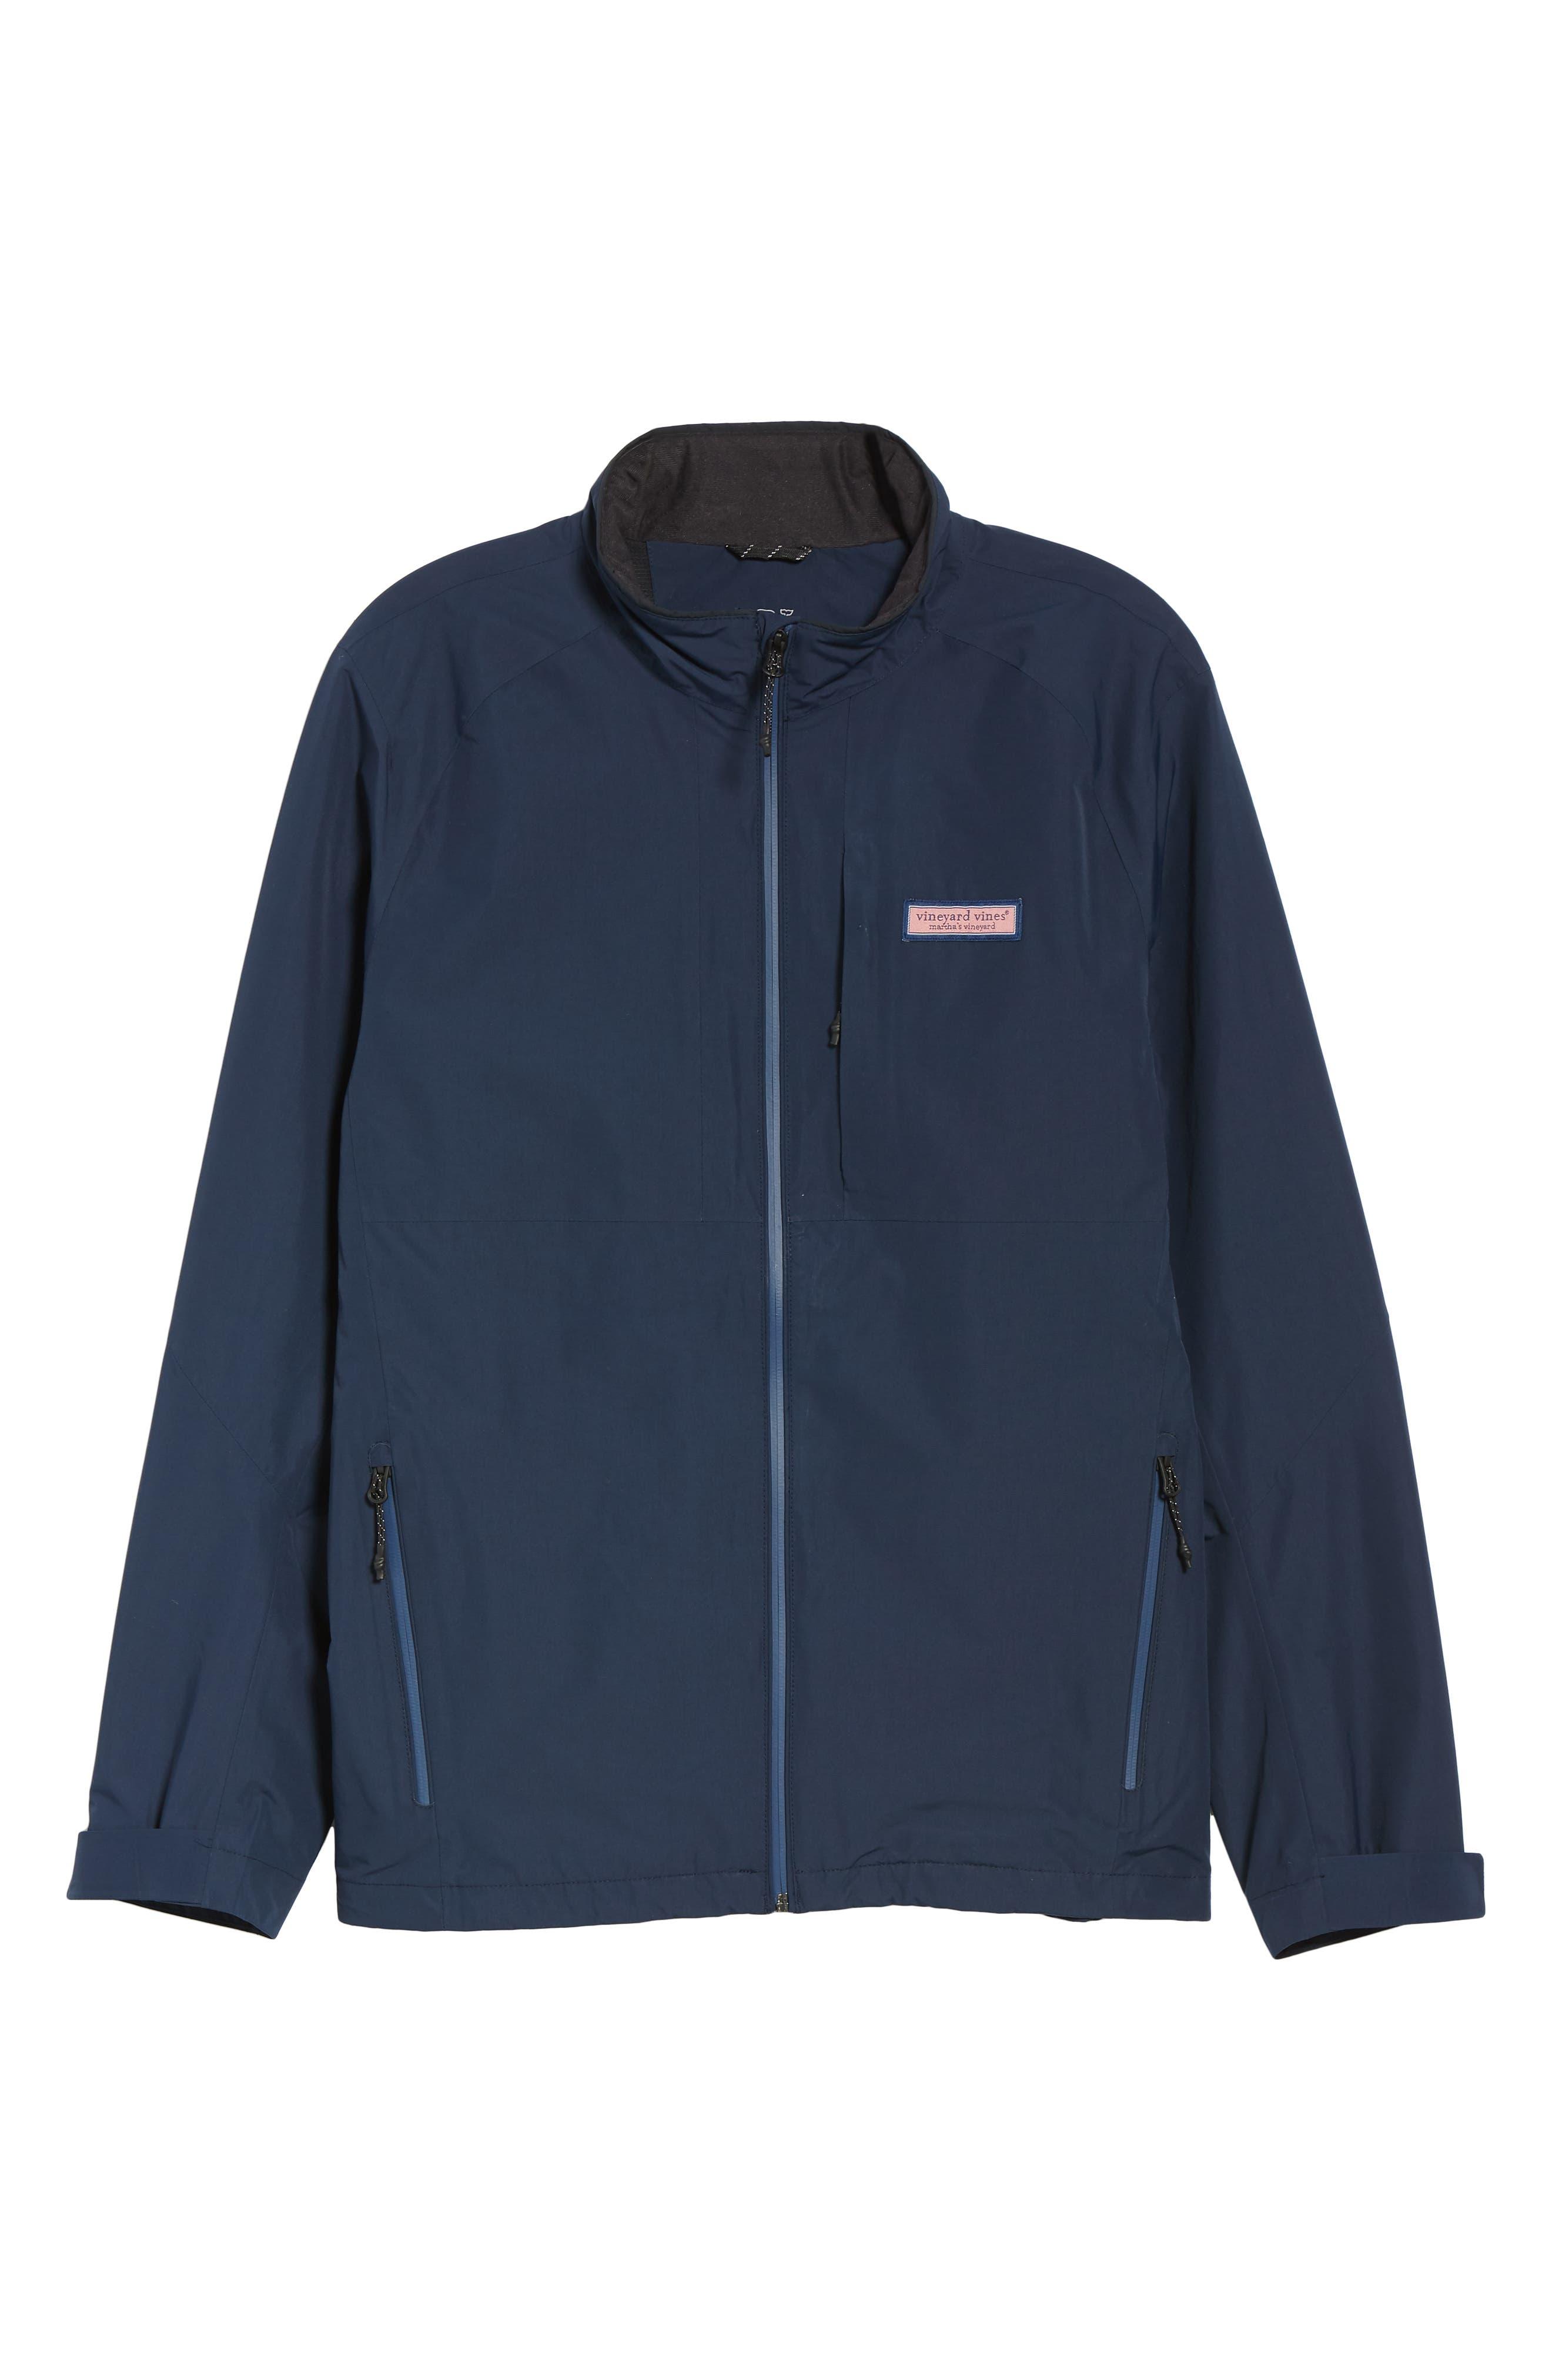 Regatta Performance Jacket,                             Alternate thumbnail 6, color,                             410